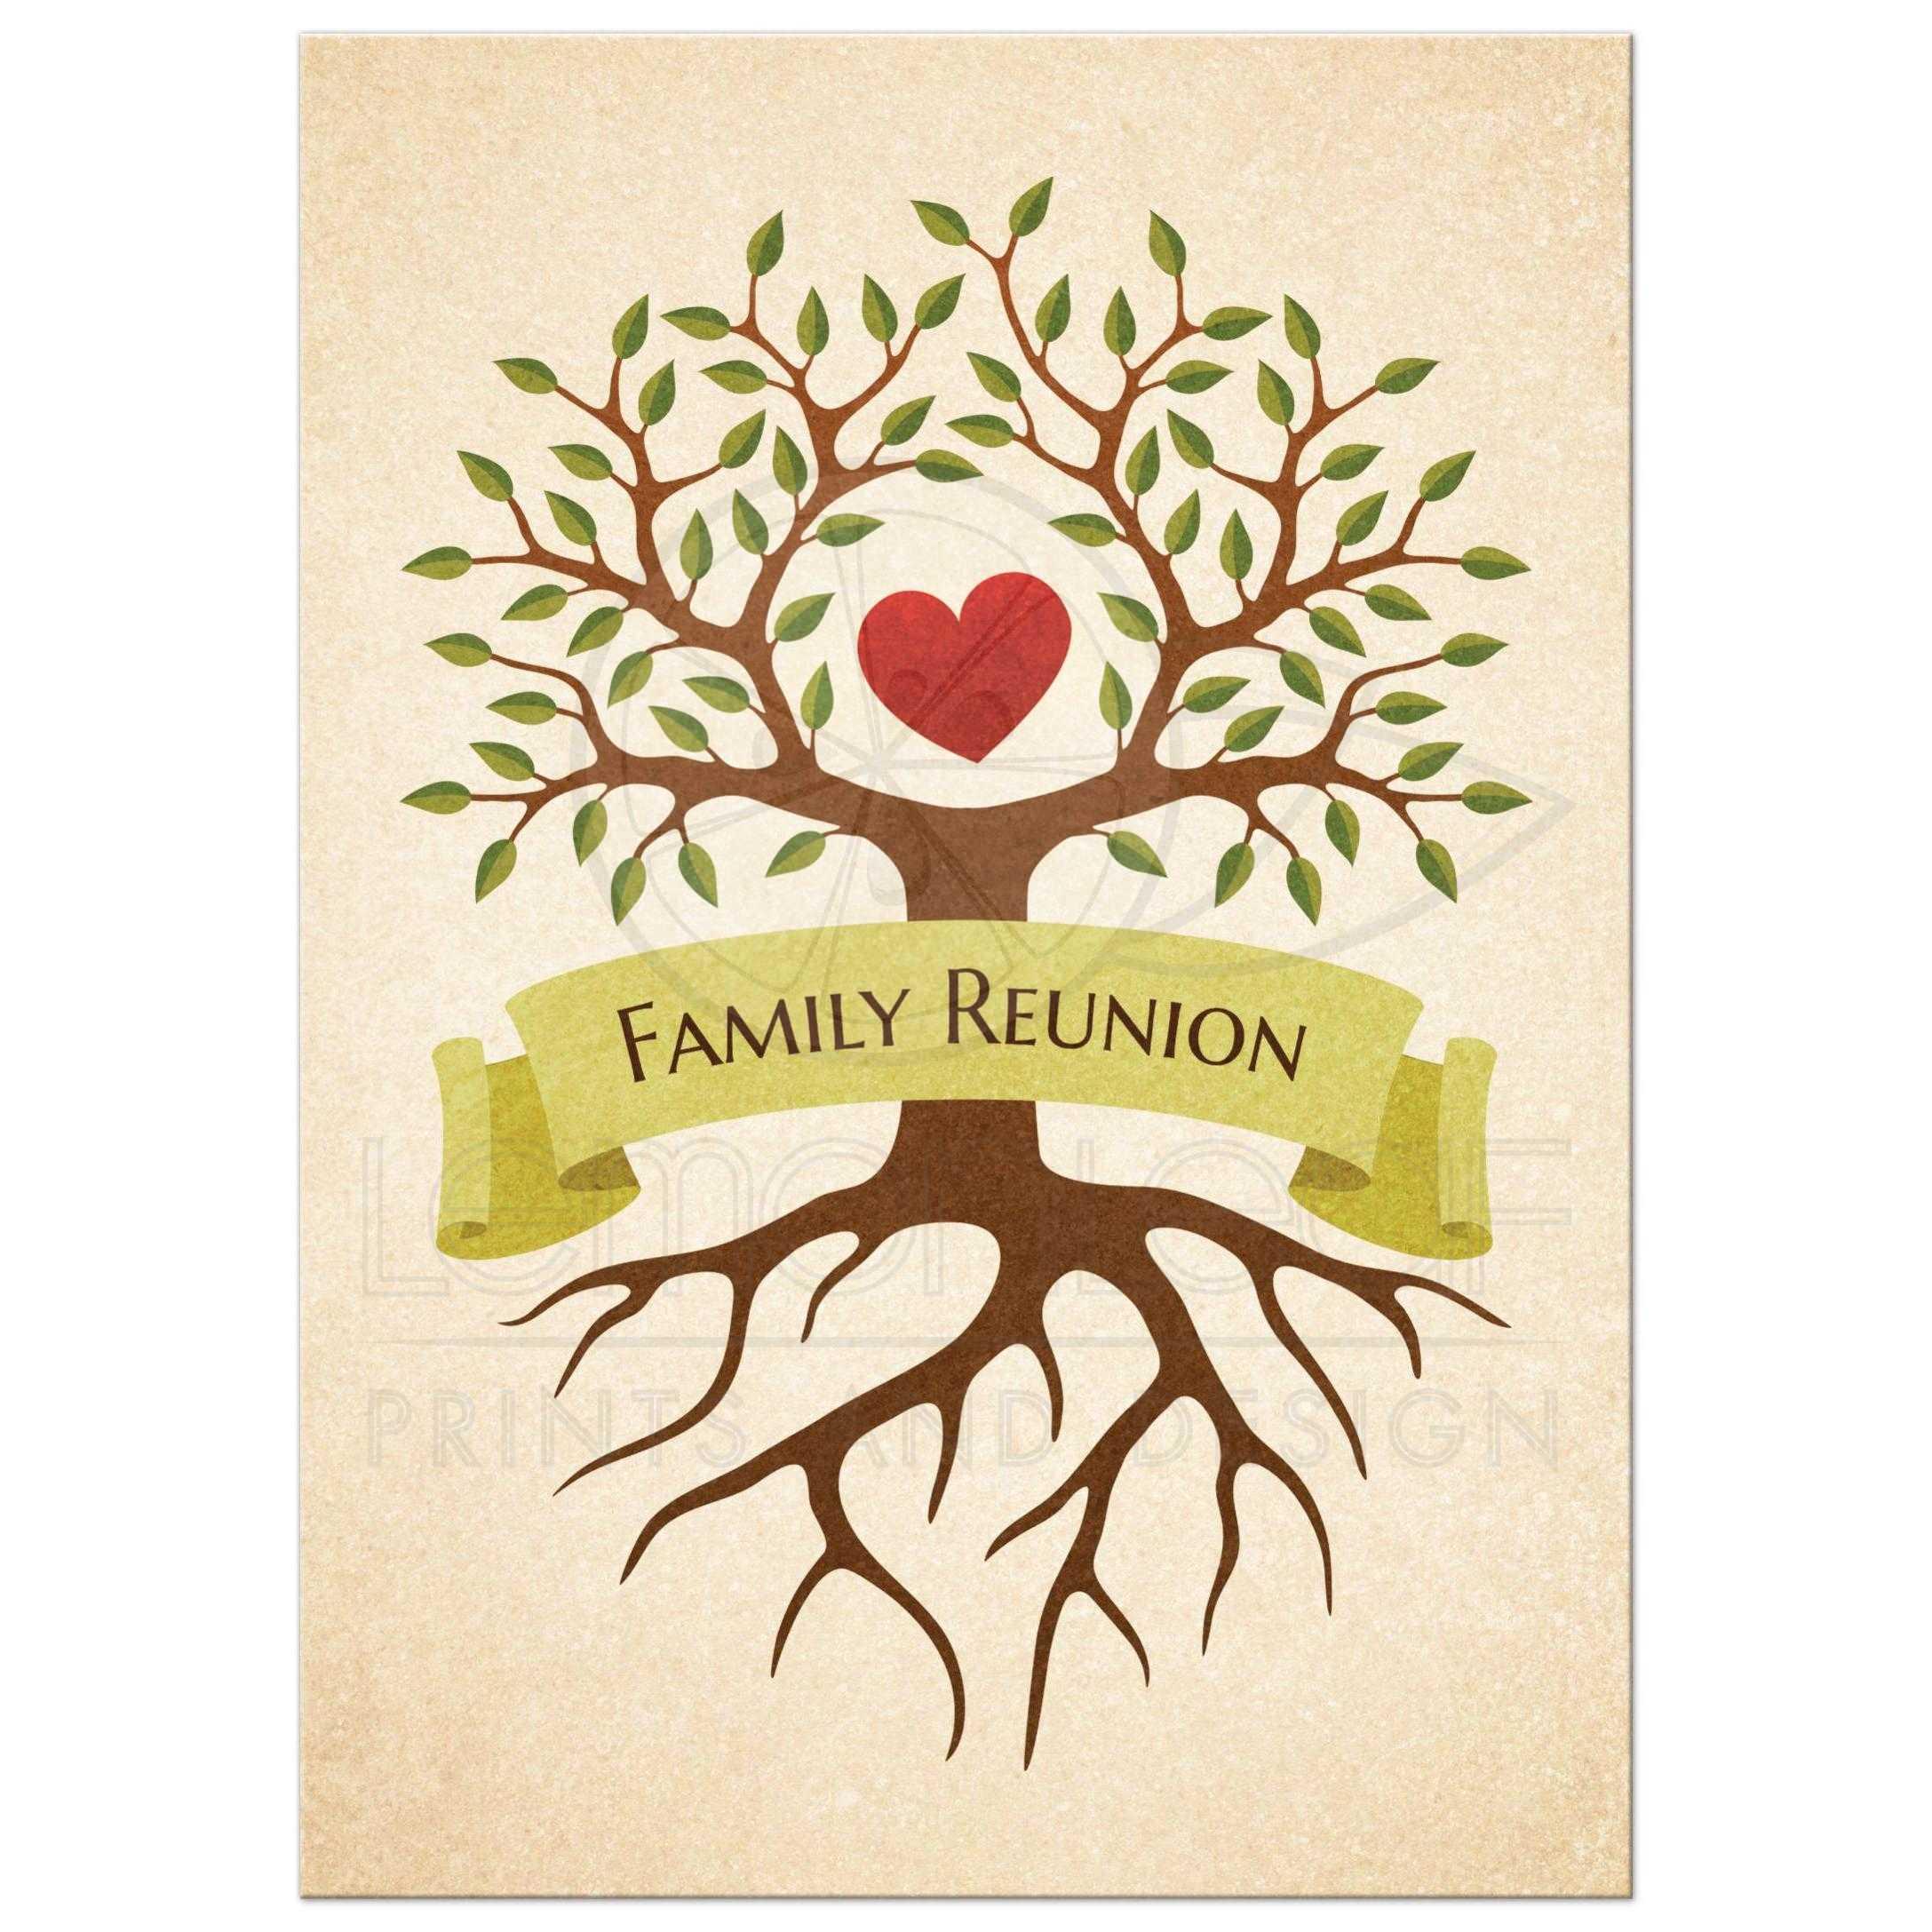 Family Reunion Invitations With Beautiful Heart Tree